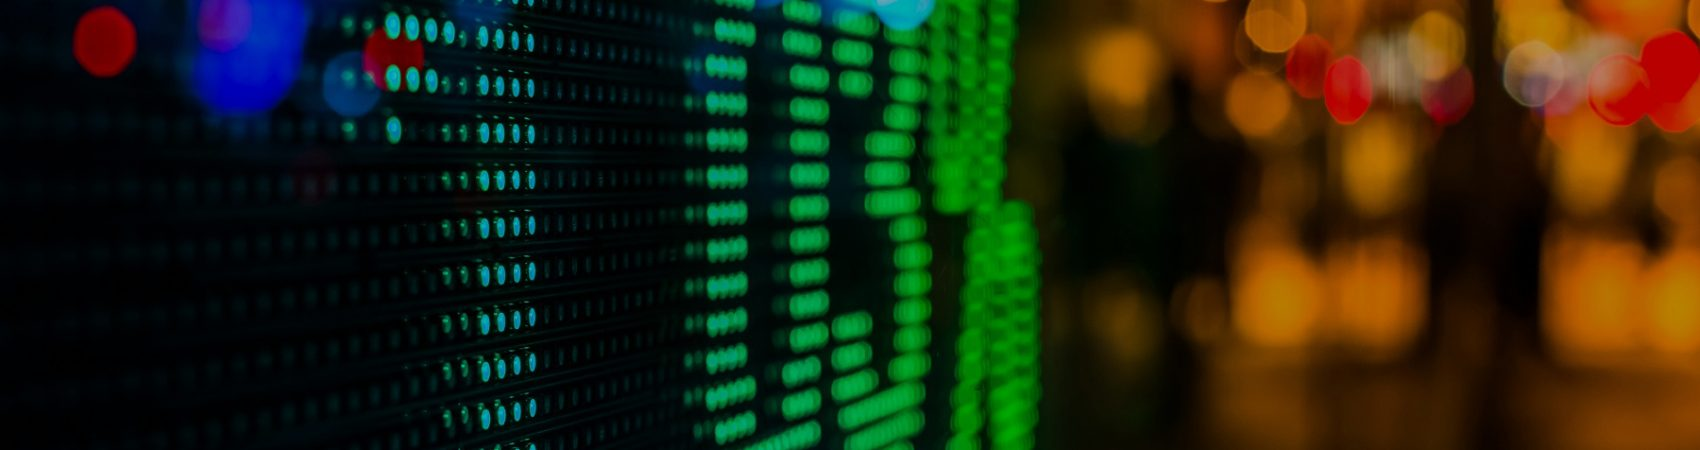 Market & Gold Sentiment Analysis & Forecast